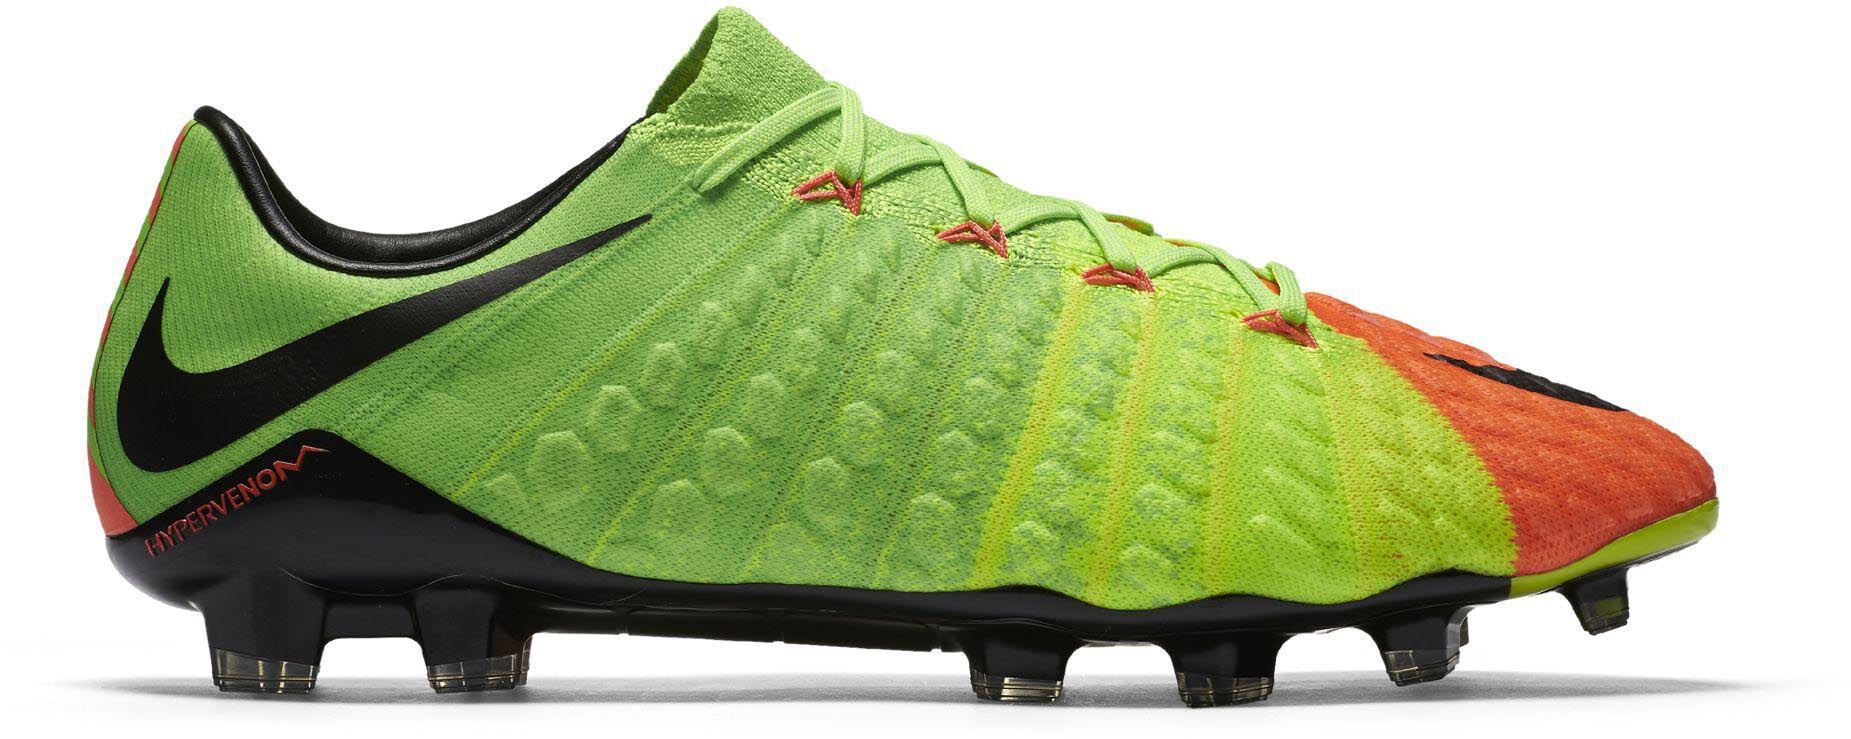 Nike Hypervenom Phantom III Fg voetbalschoenen Heren Groen